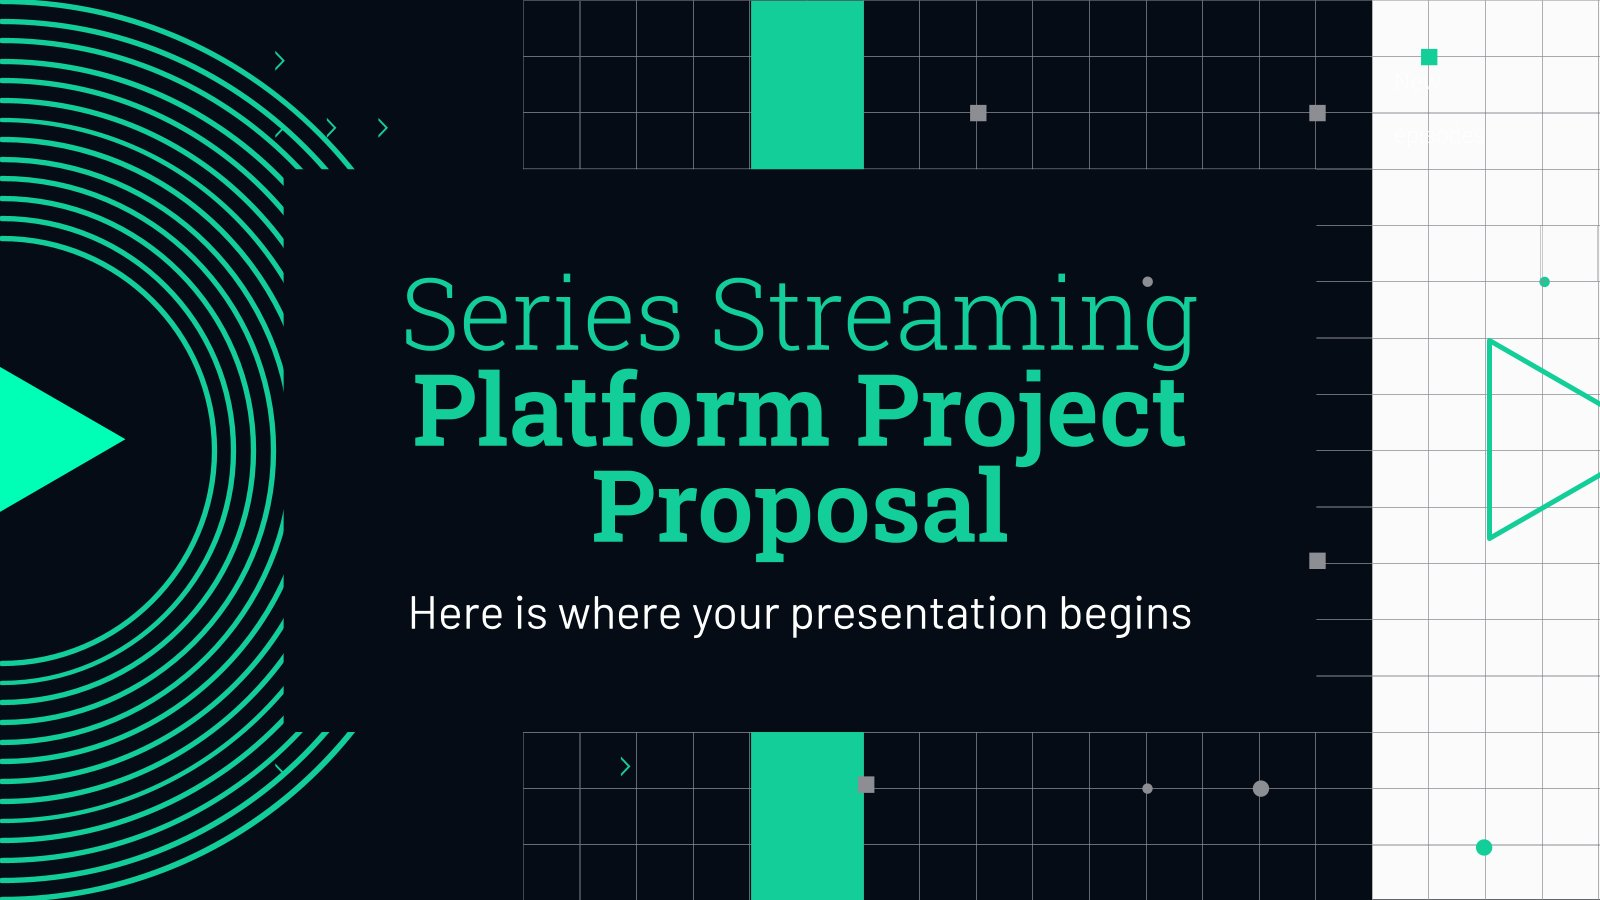 Series Streaming Platform Project Proposal presentation template